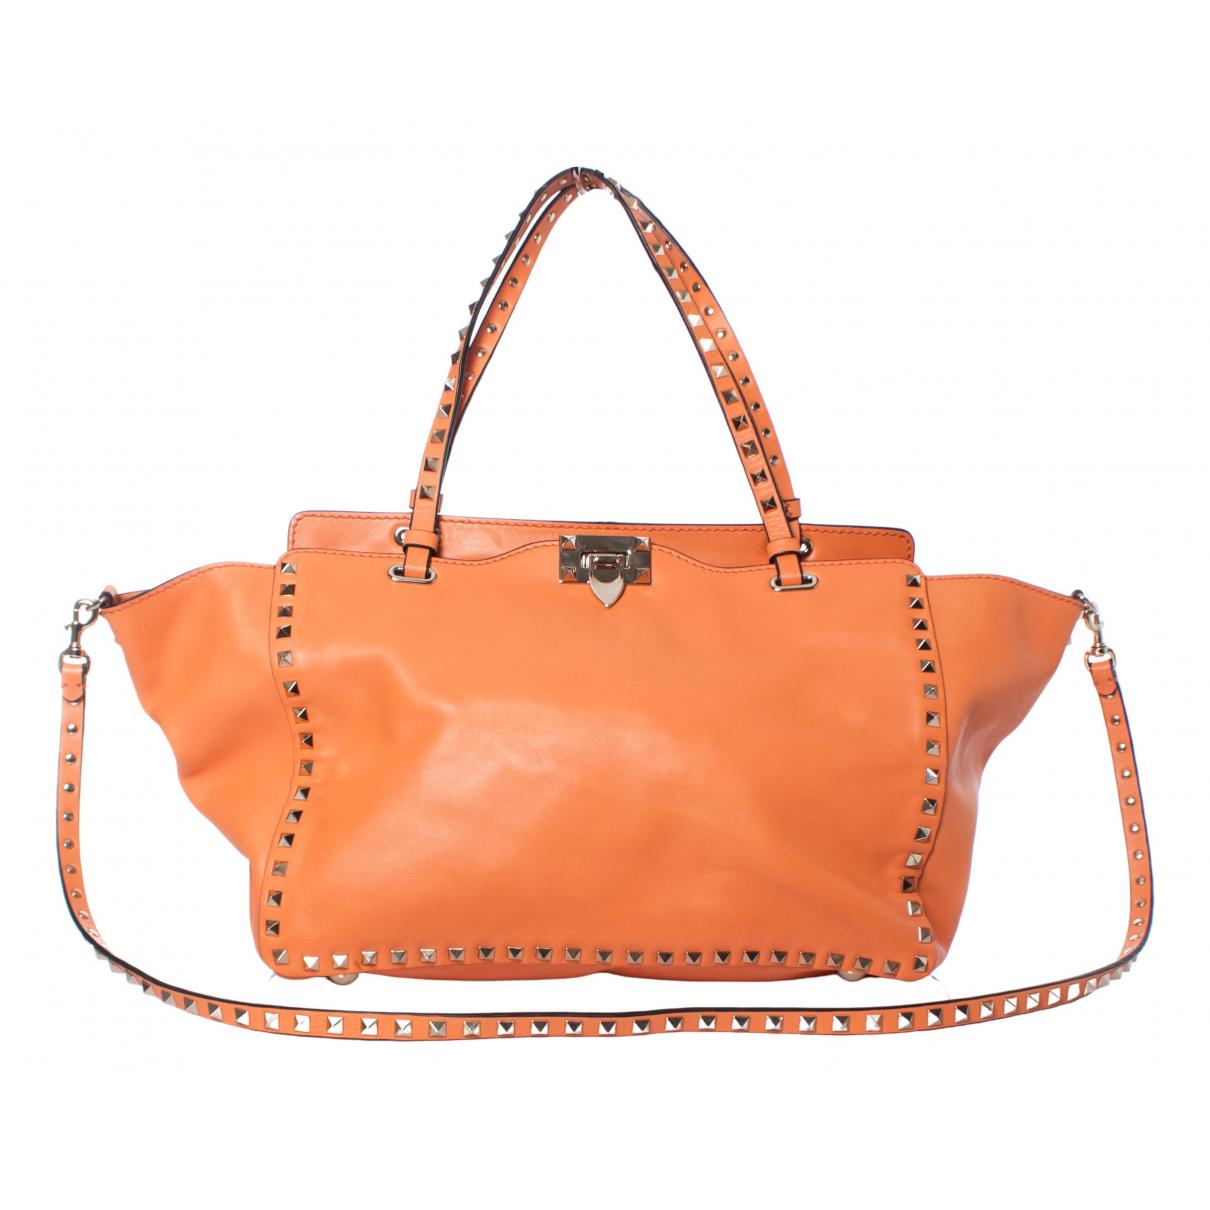 Valentino Garavani Rockstud Orange Leather handbag for Women \N